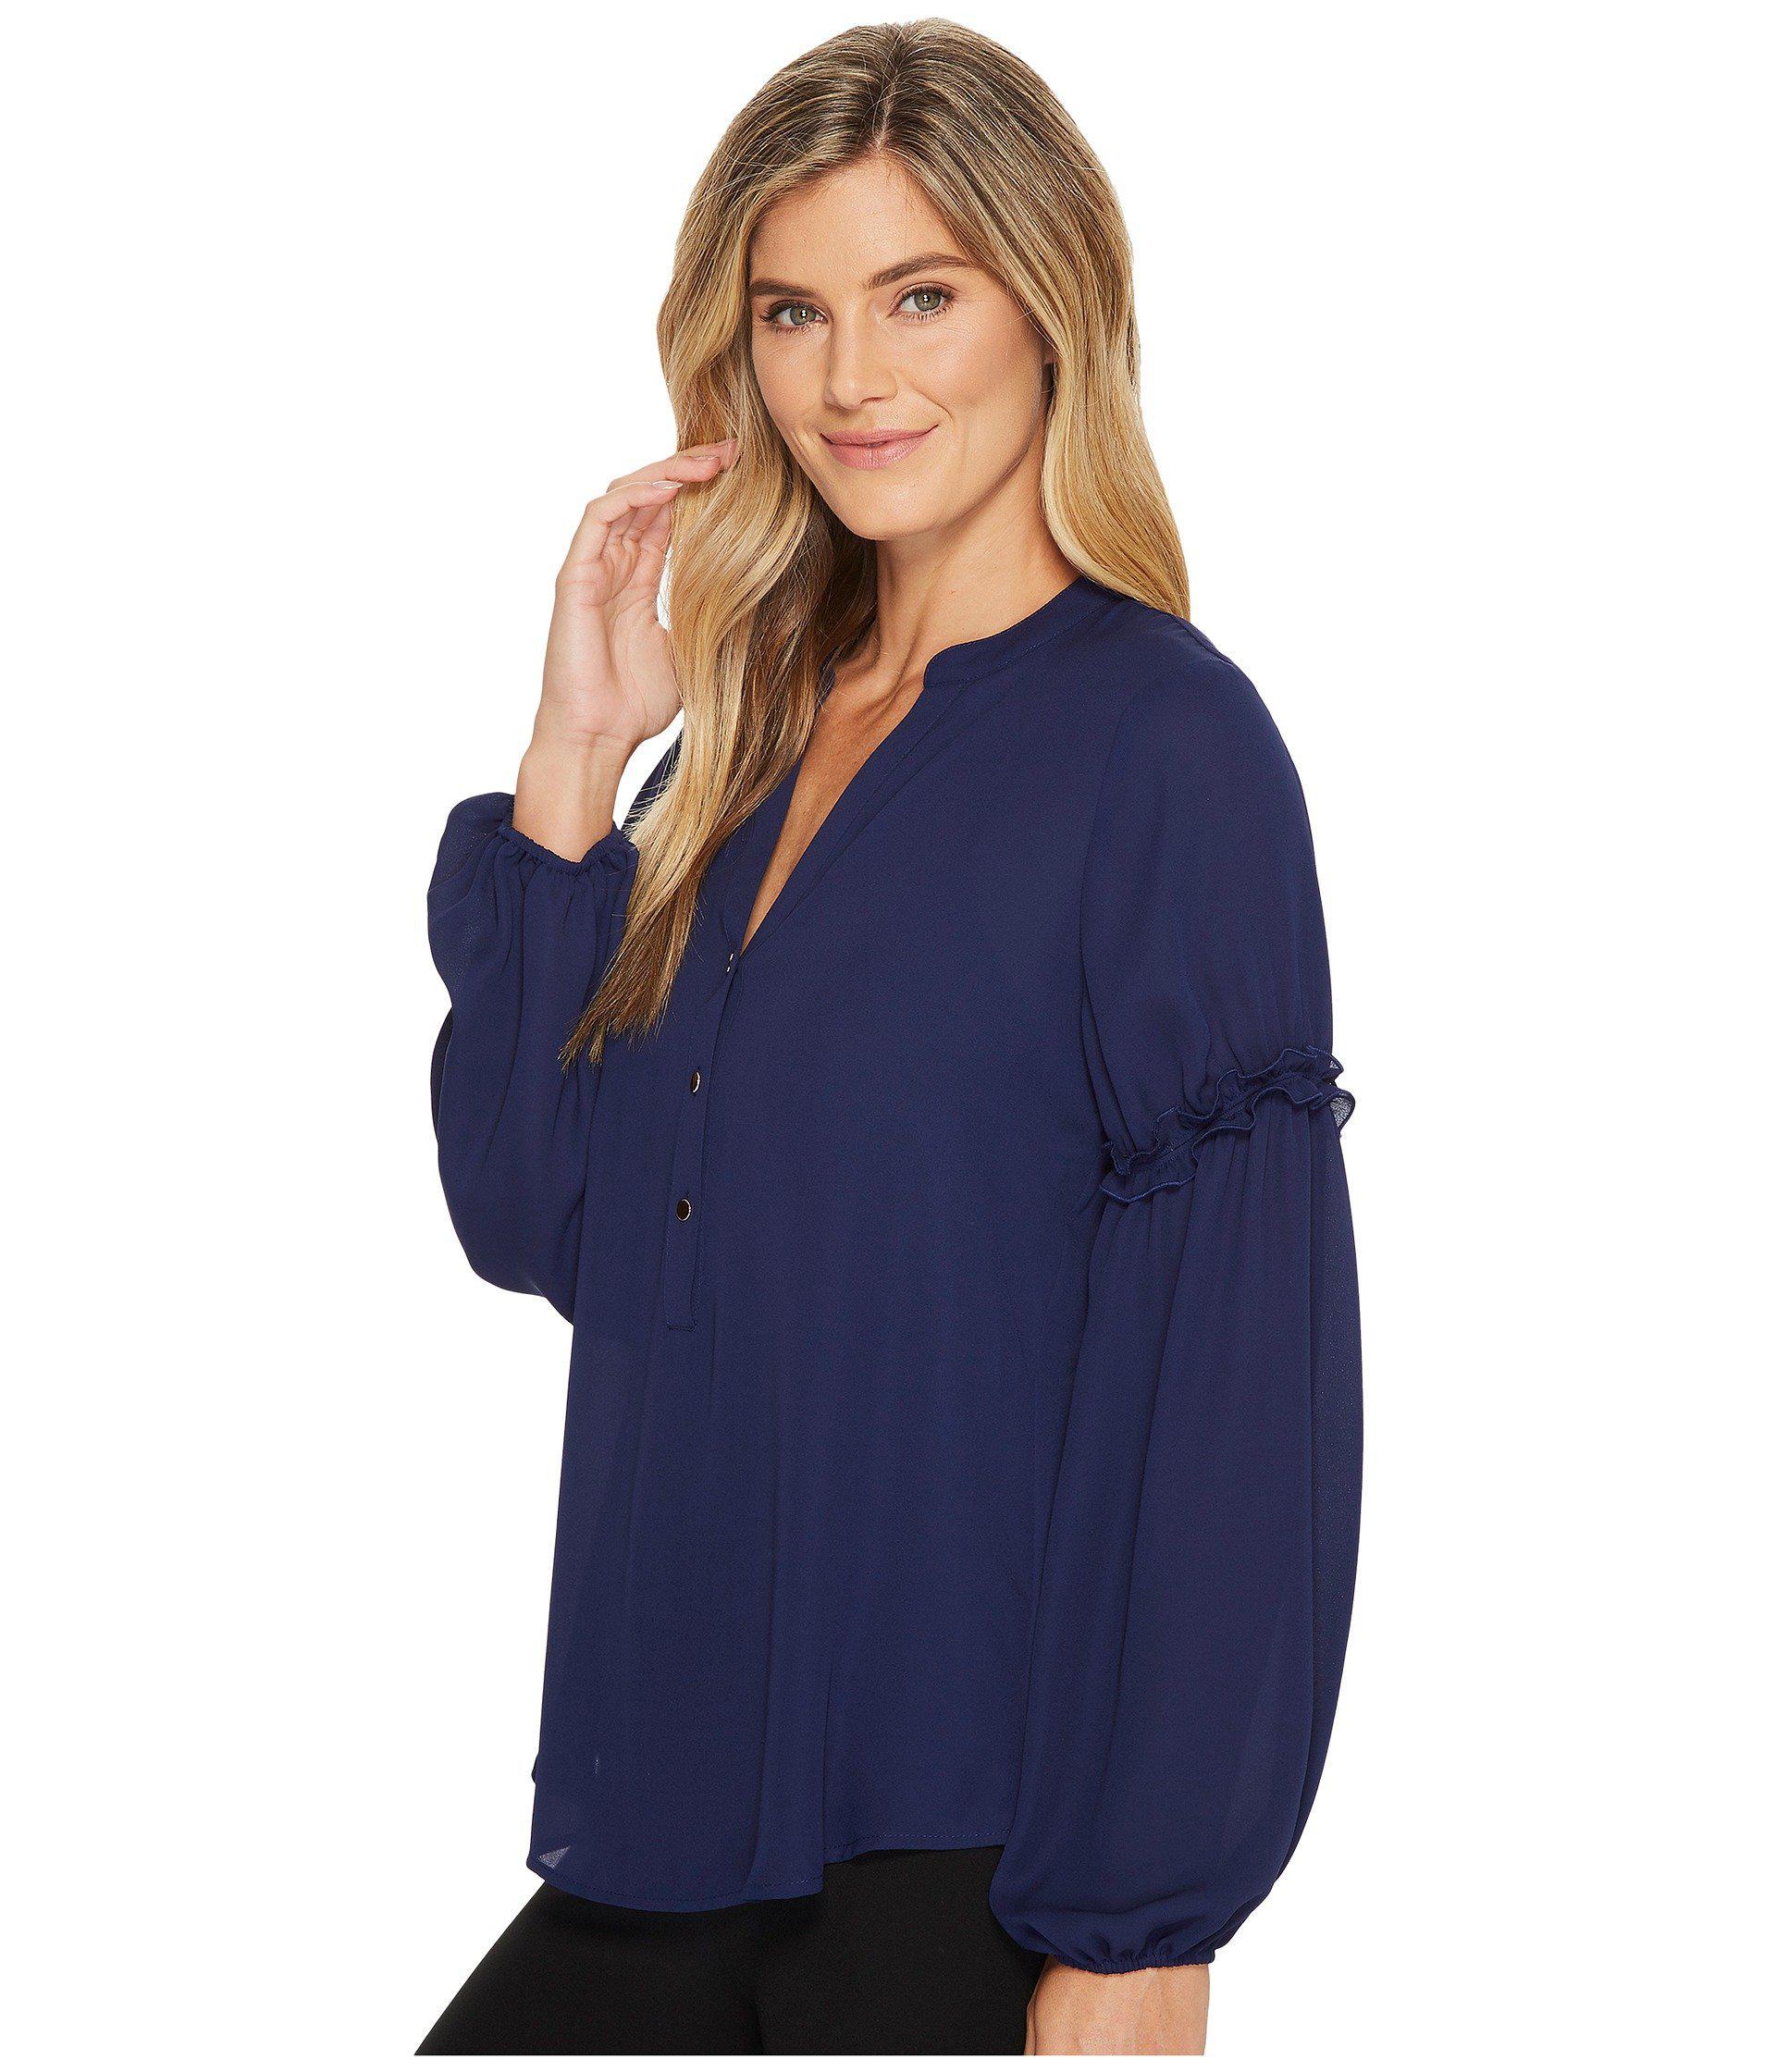 b50c679bb2e7fc Lyst - Ivanka Trump Georgette Long Sleeve Pleasant Blouse in Blue - Save 51%